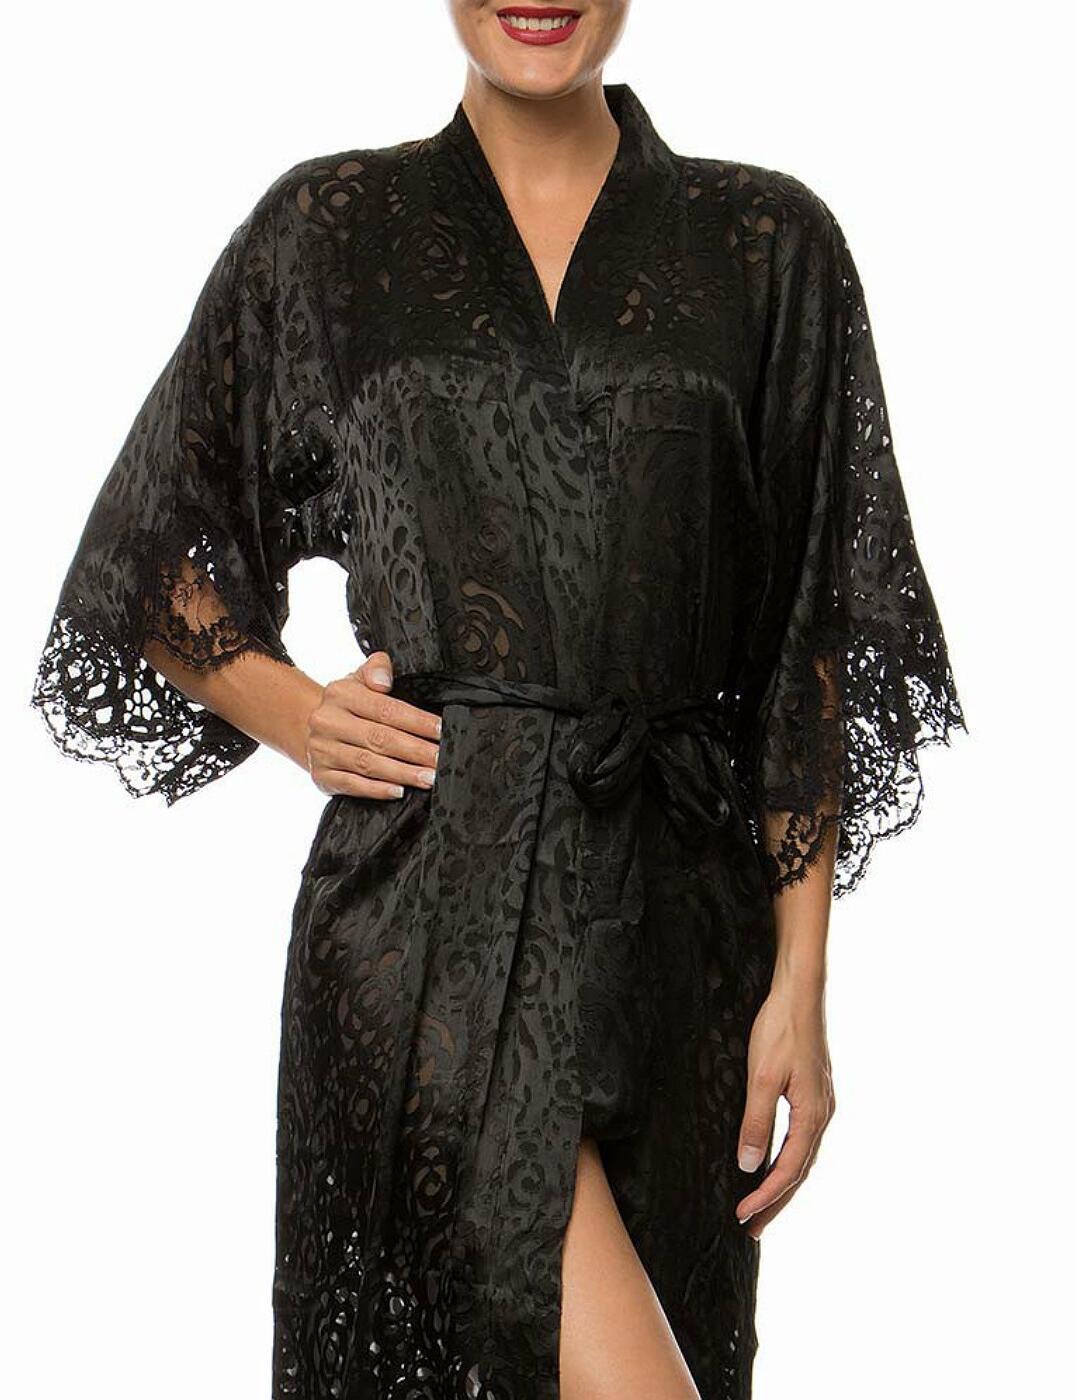 ALC2088 Lise Charmel Dressing Floral Robe - ALC2088 Noir